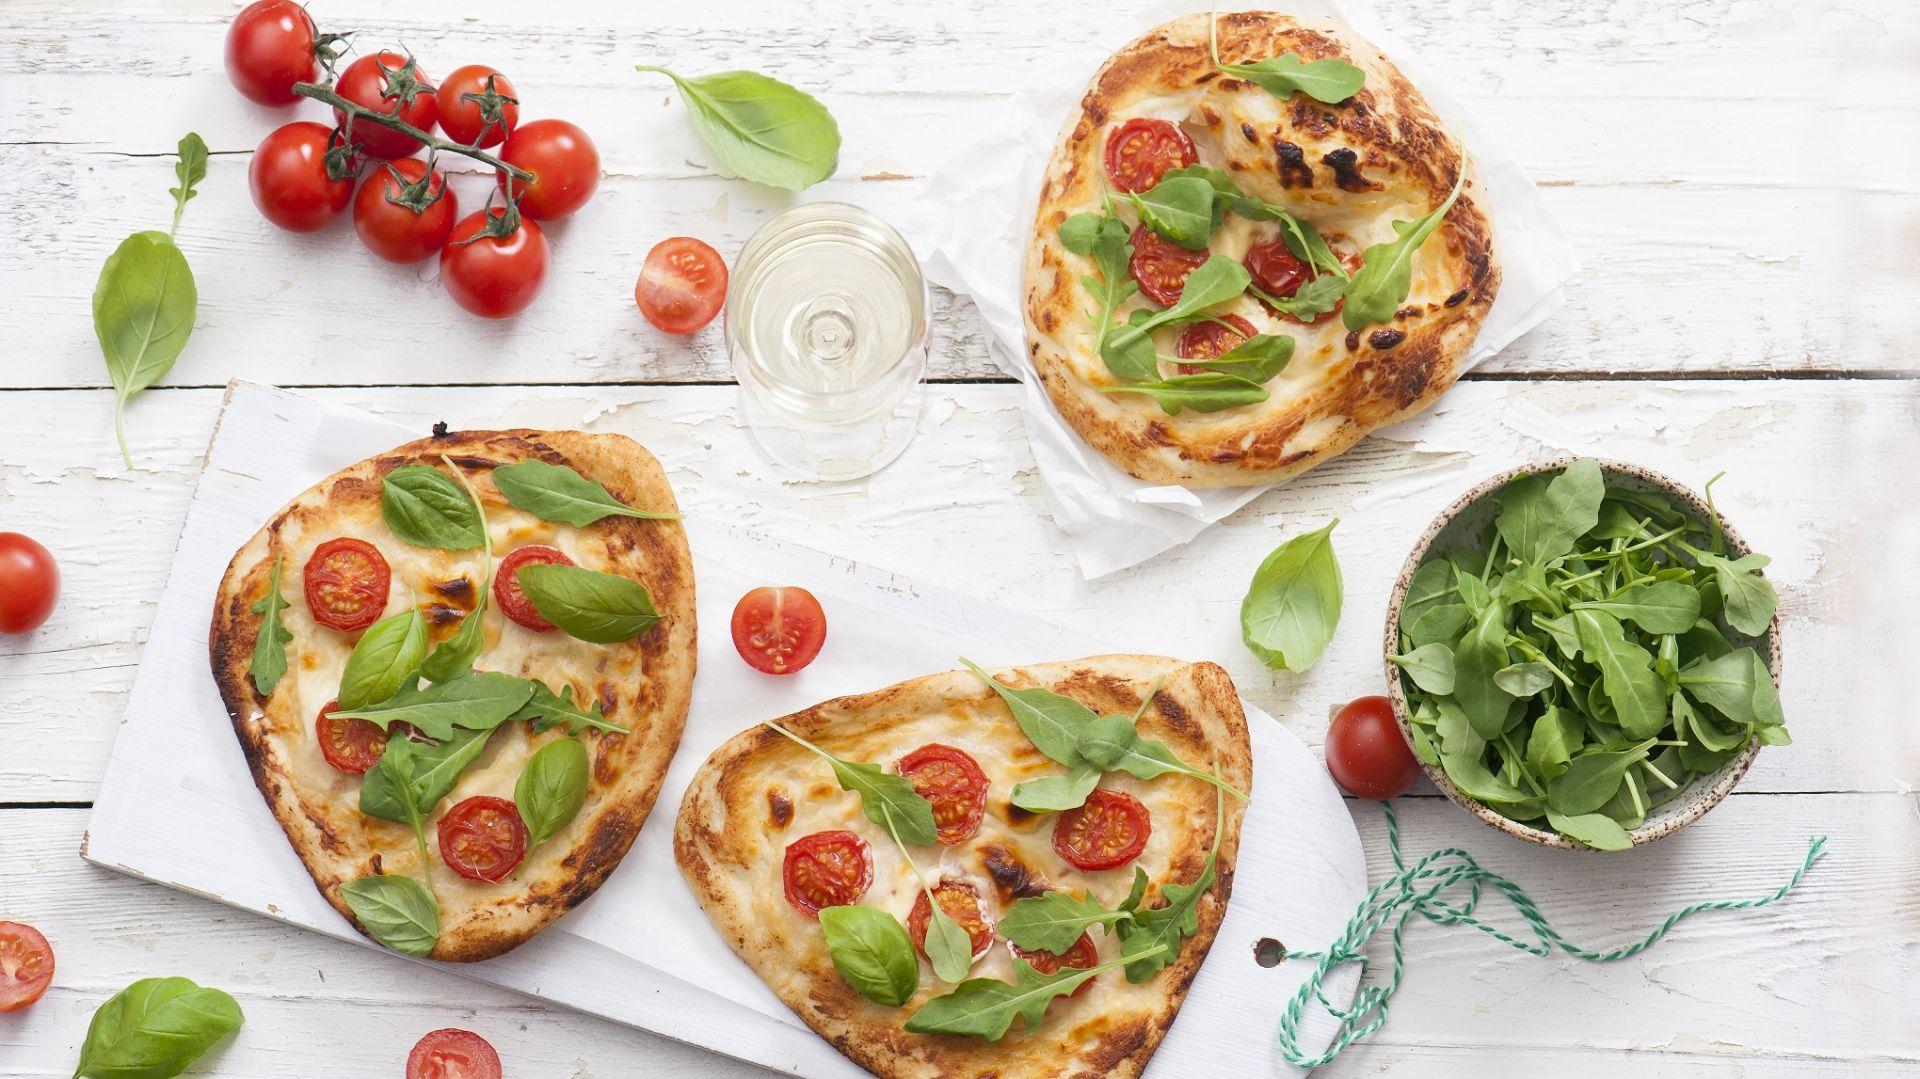 Mini pizza z topionym serkiem, pomidorami i rukolą. Fot. Hochland